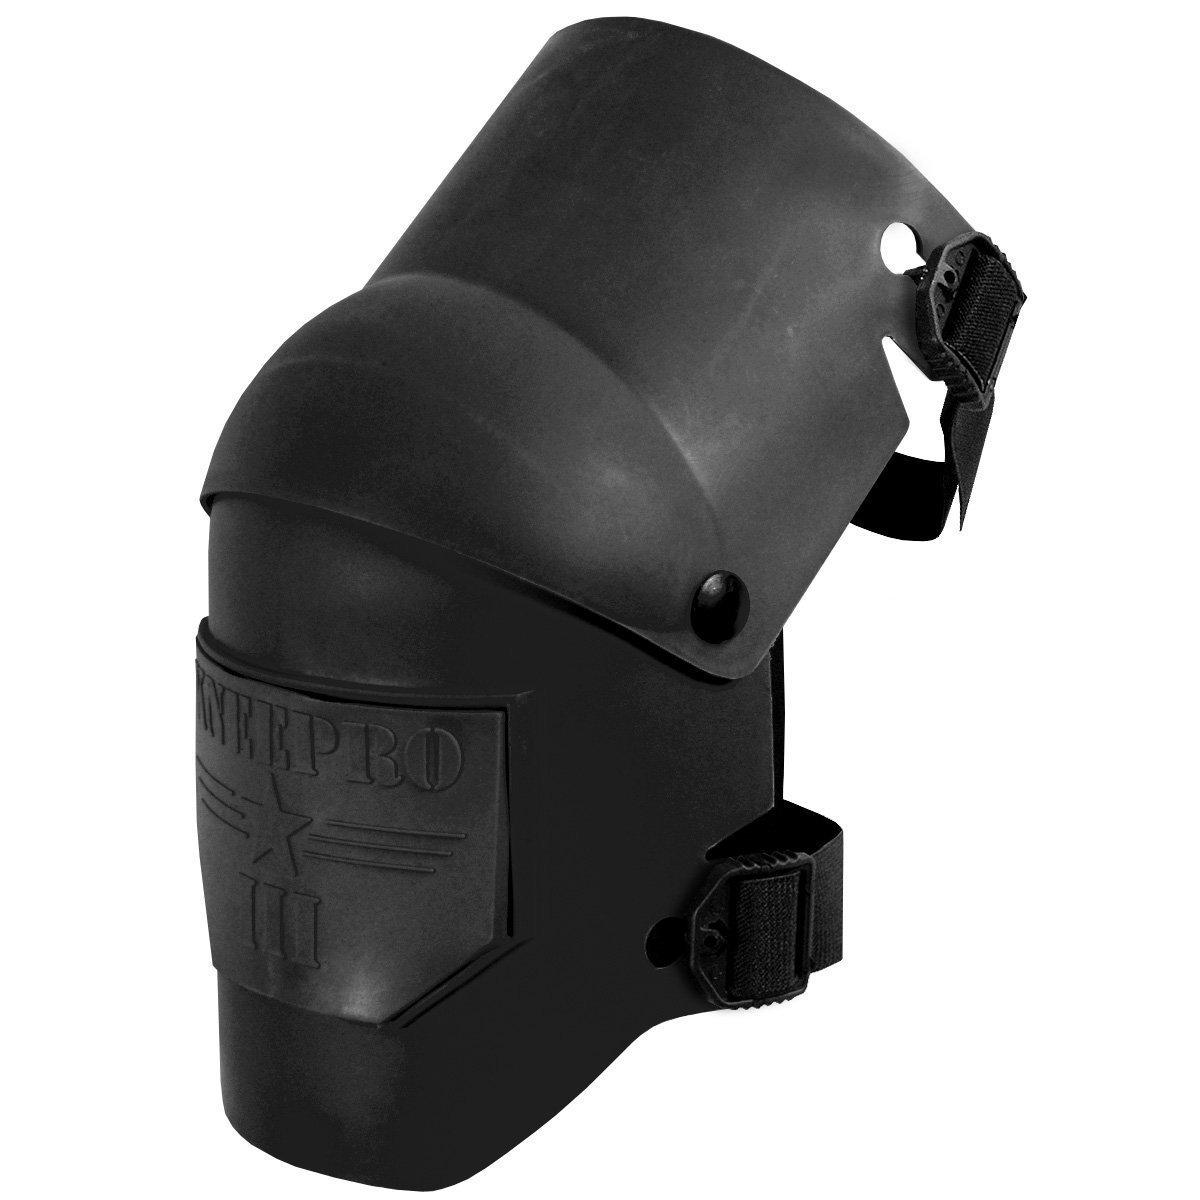 KP Ultra flex Industries Knee Pads